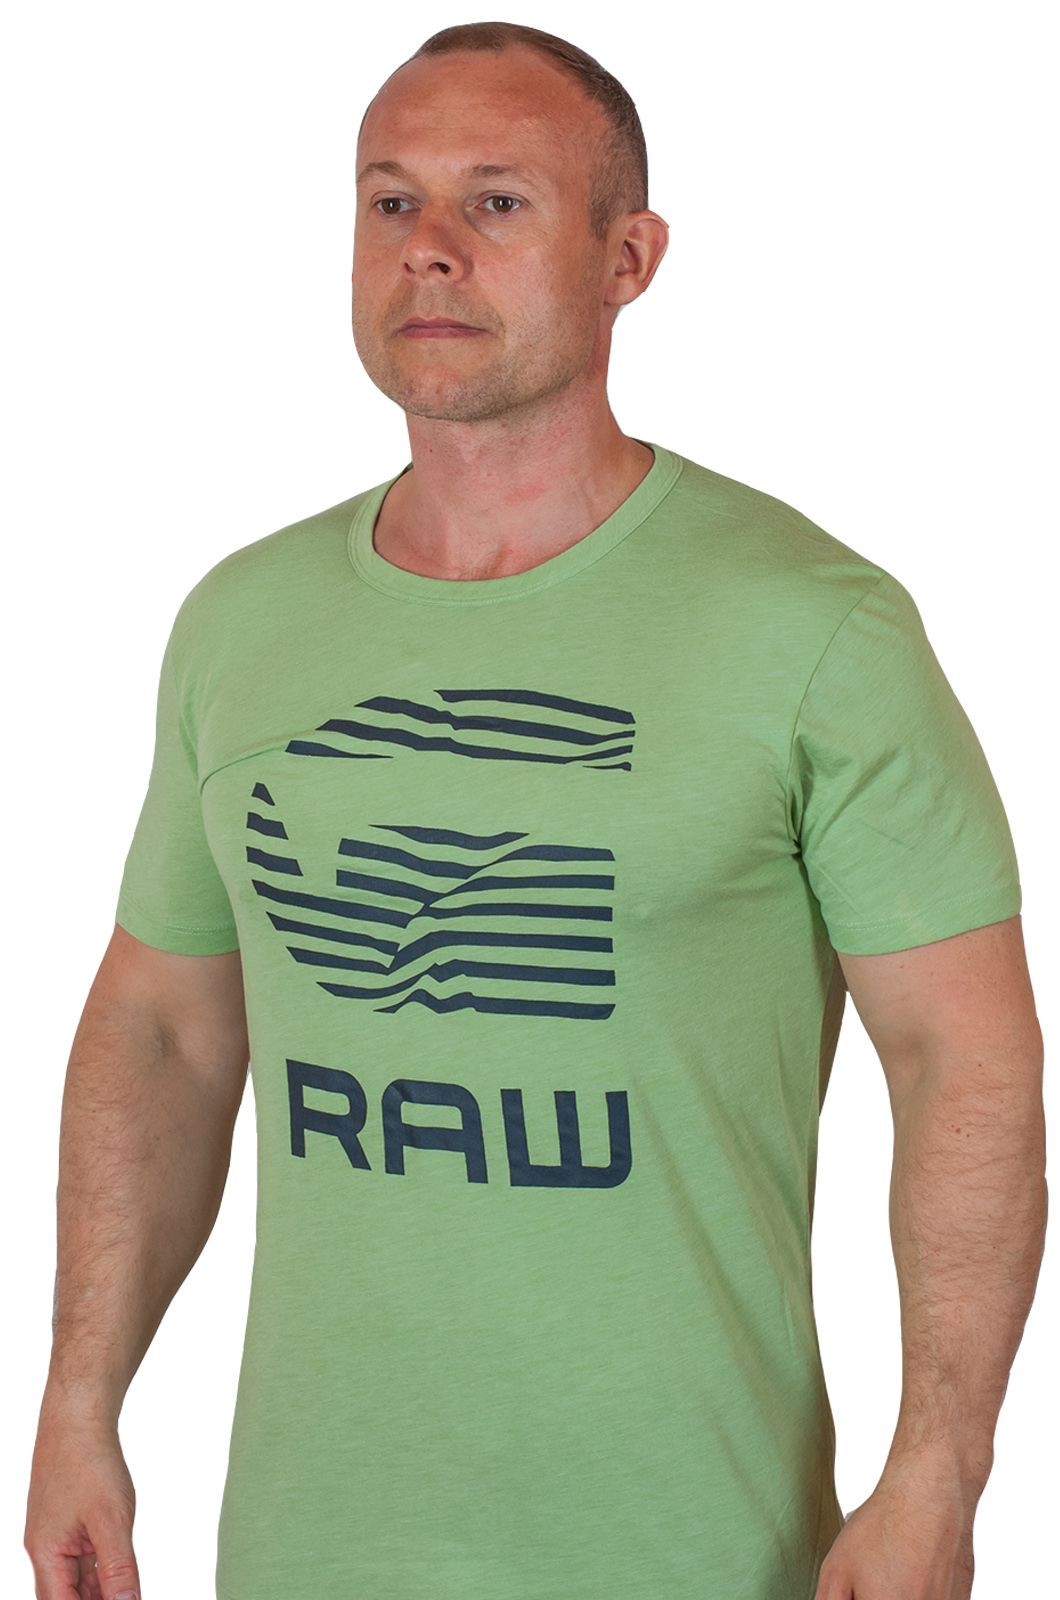 Футболка на лето 2017 G-Star Raw® Radcort